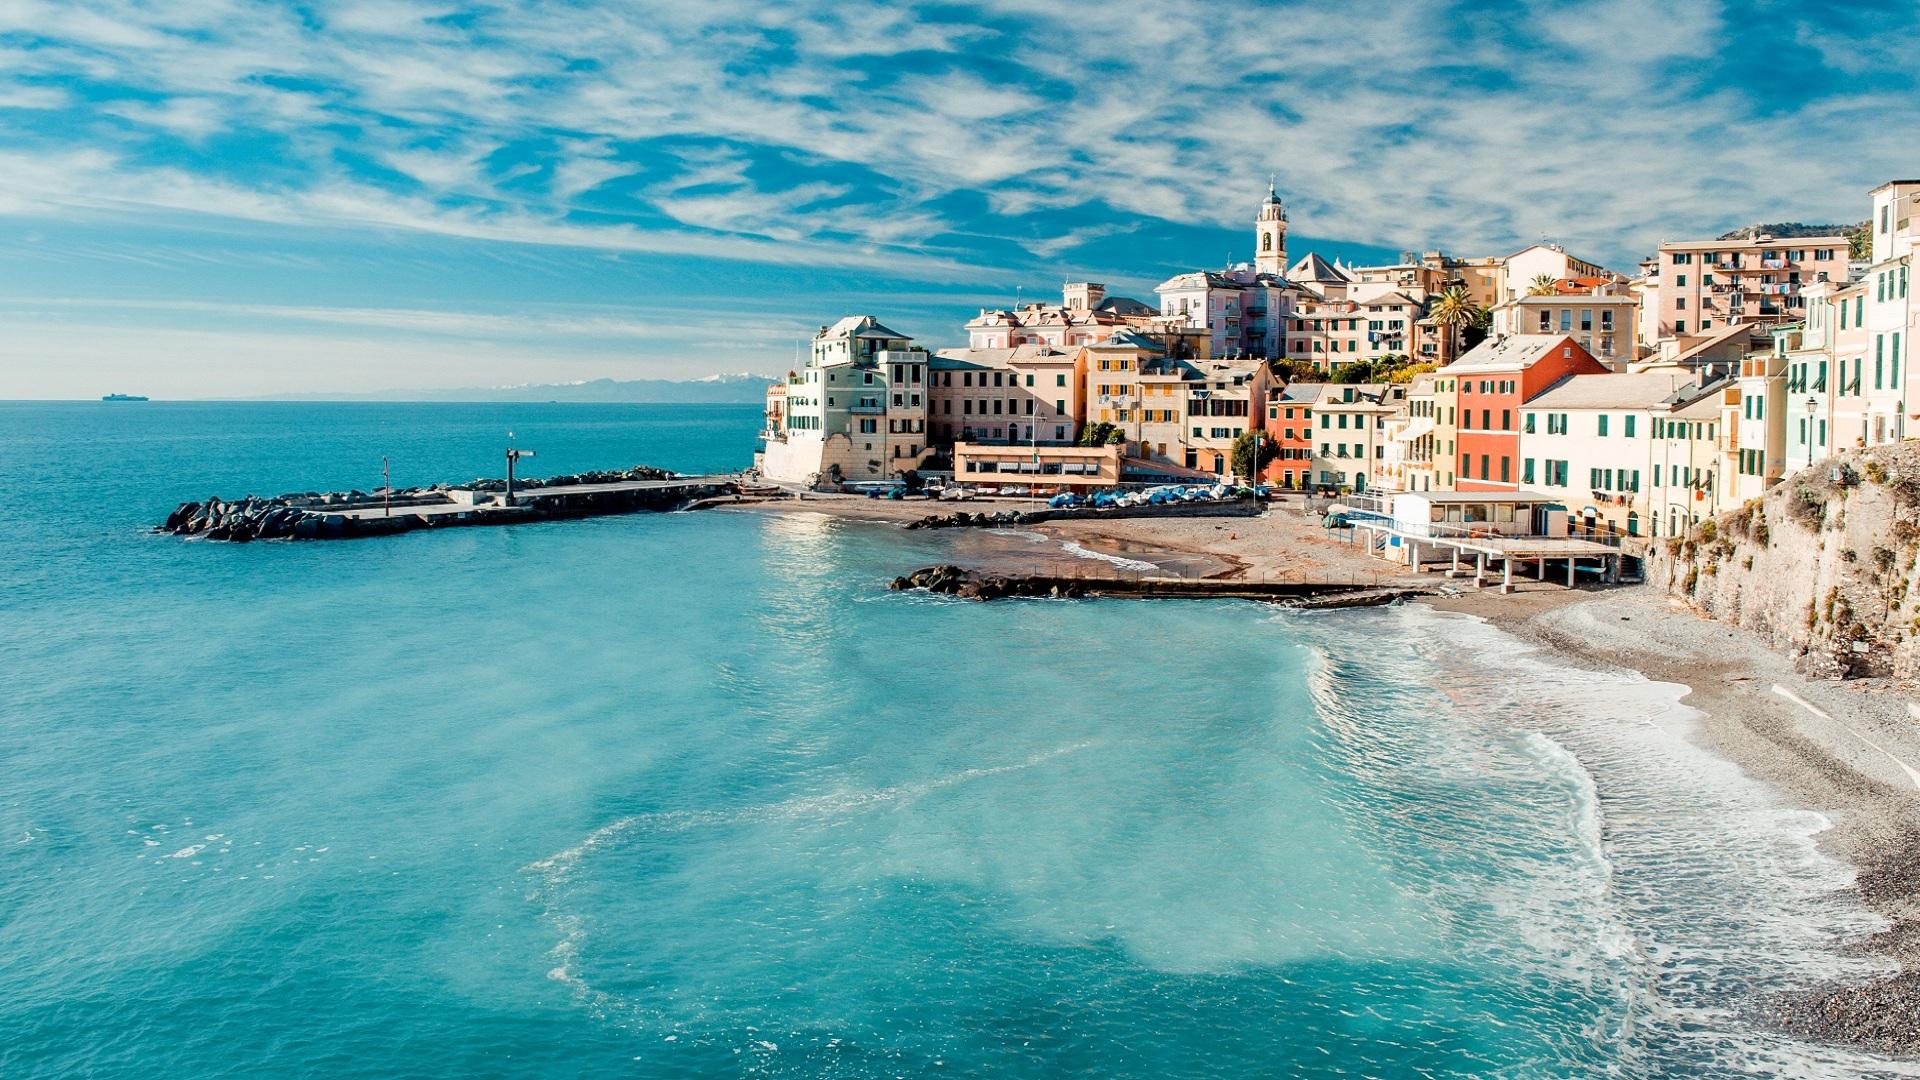 Oferta de viaje a Corfu